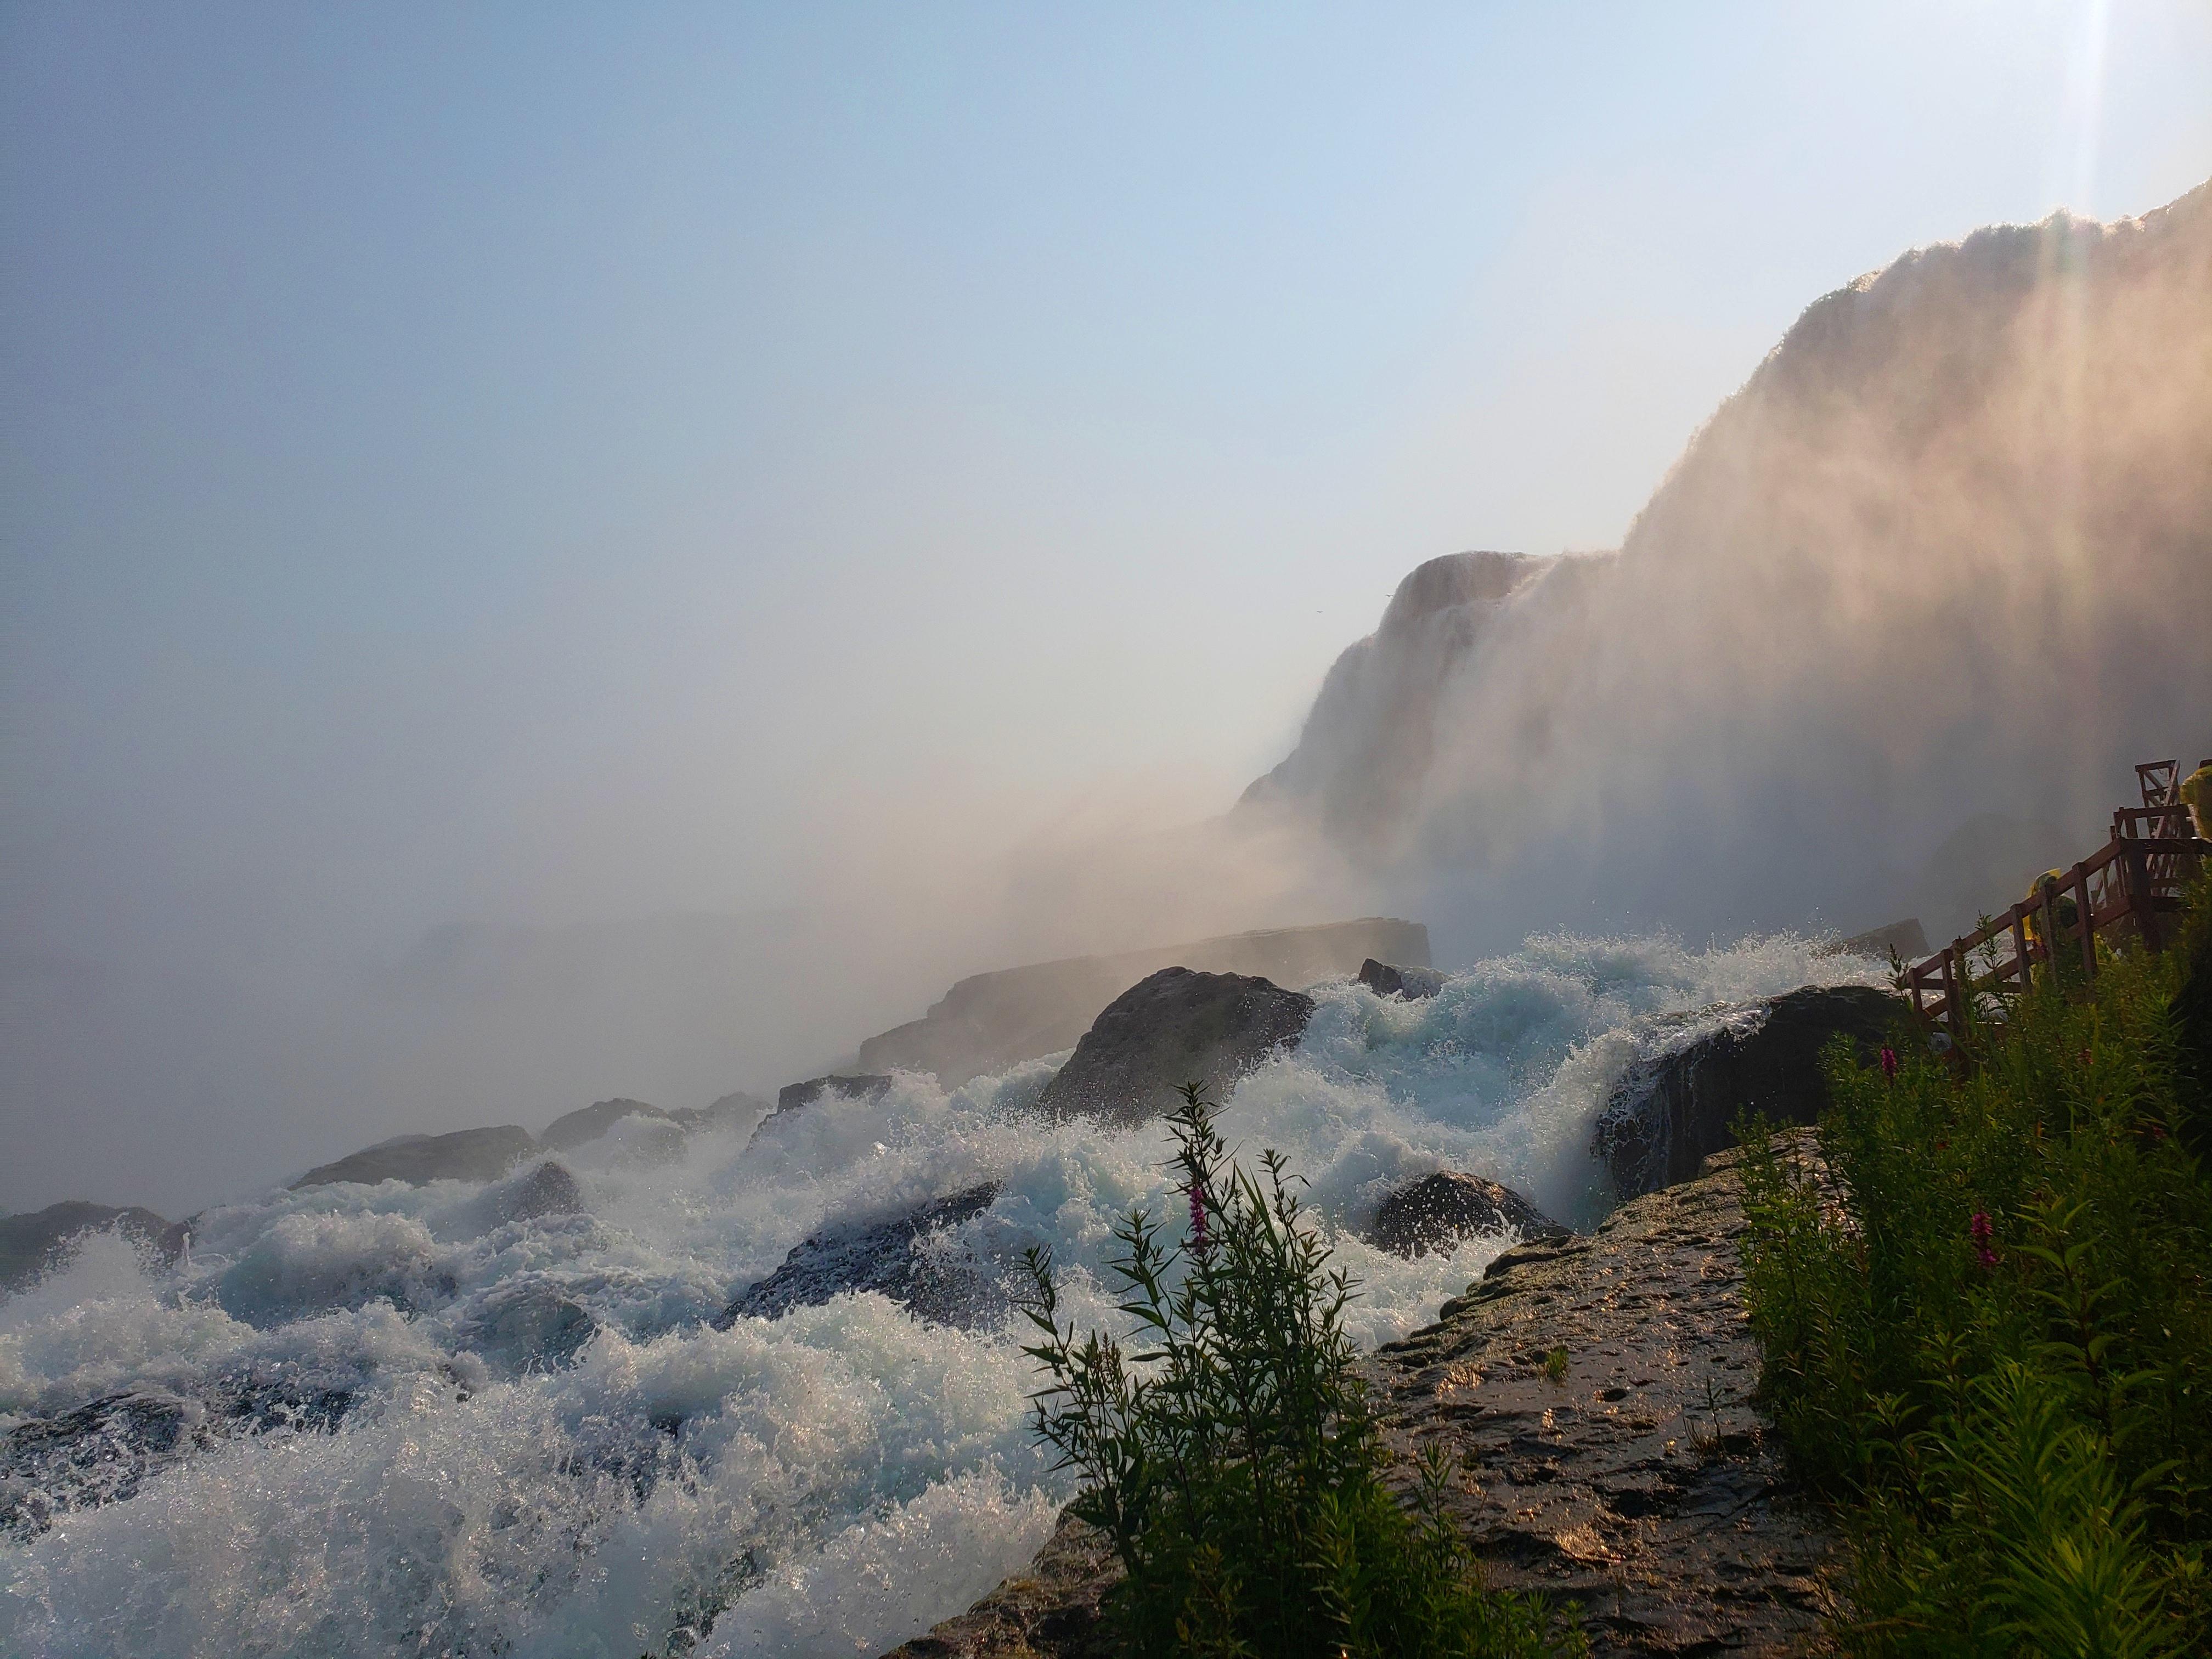 Water cascading over rocks as it falls in Niagara Falls.